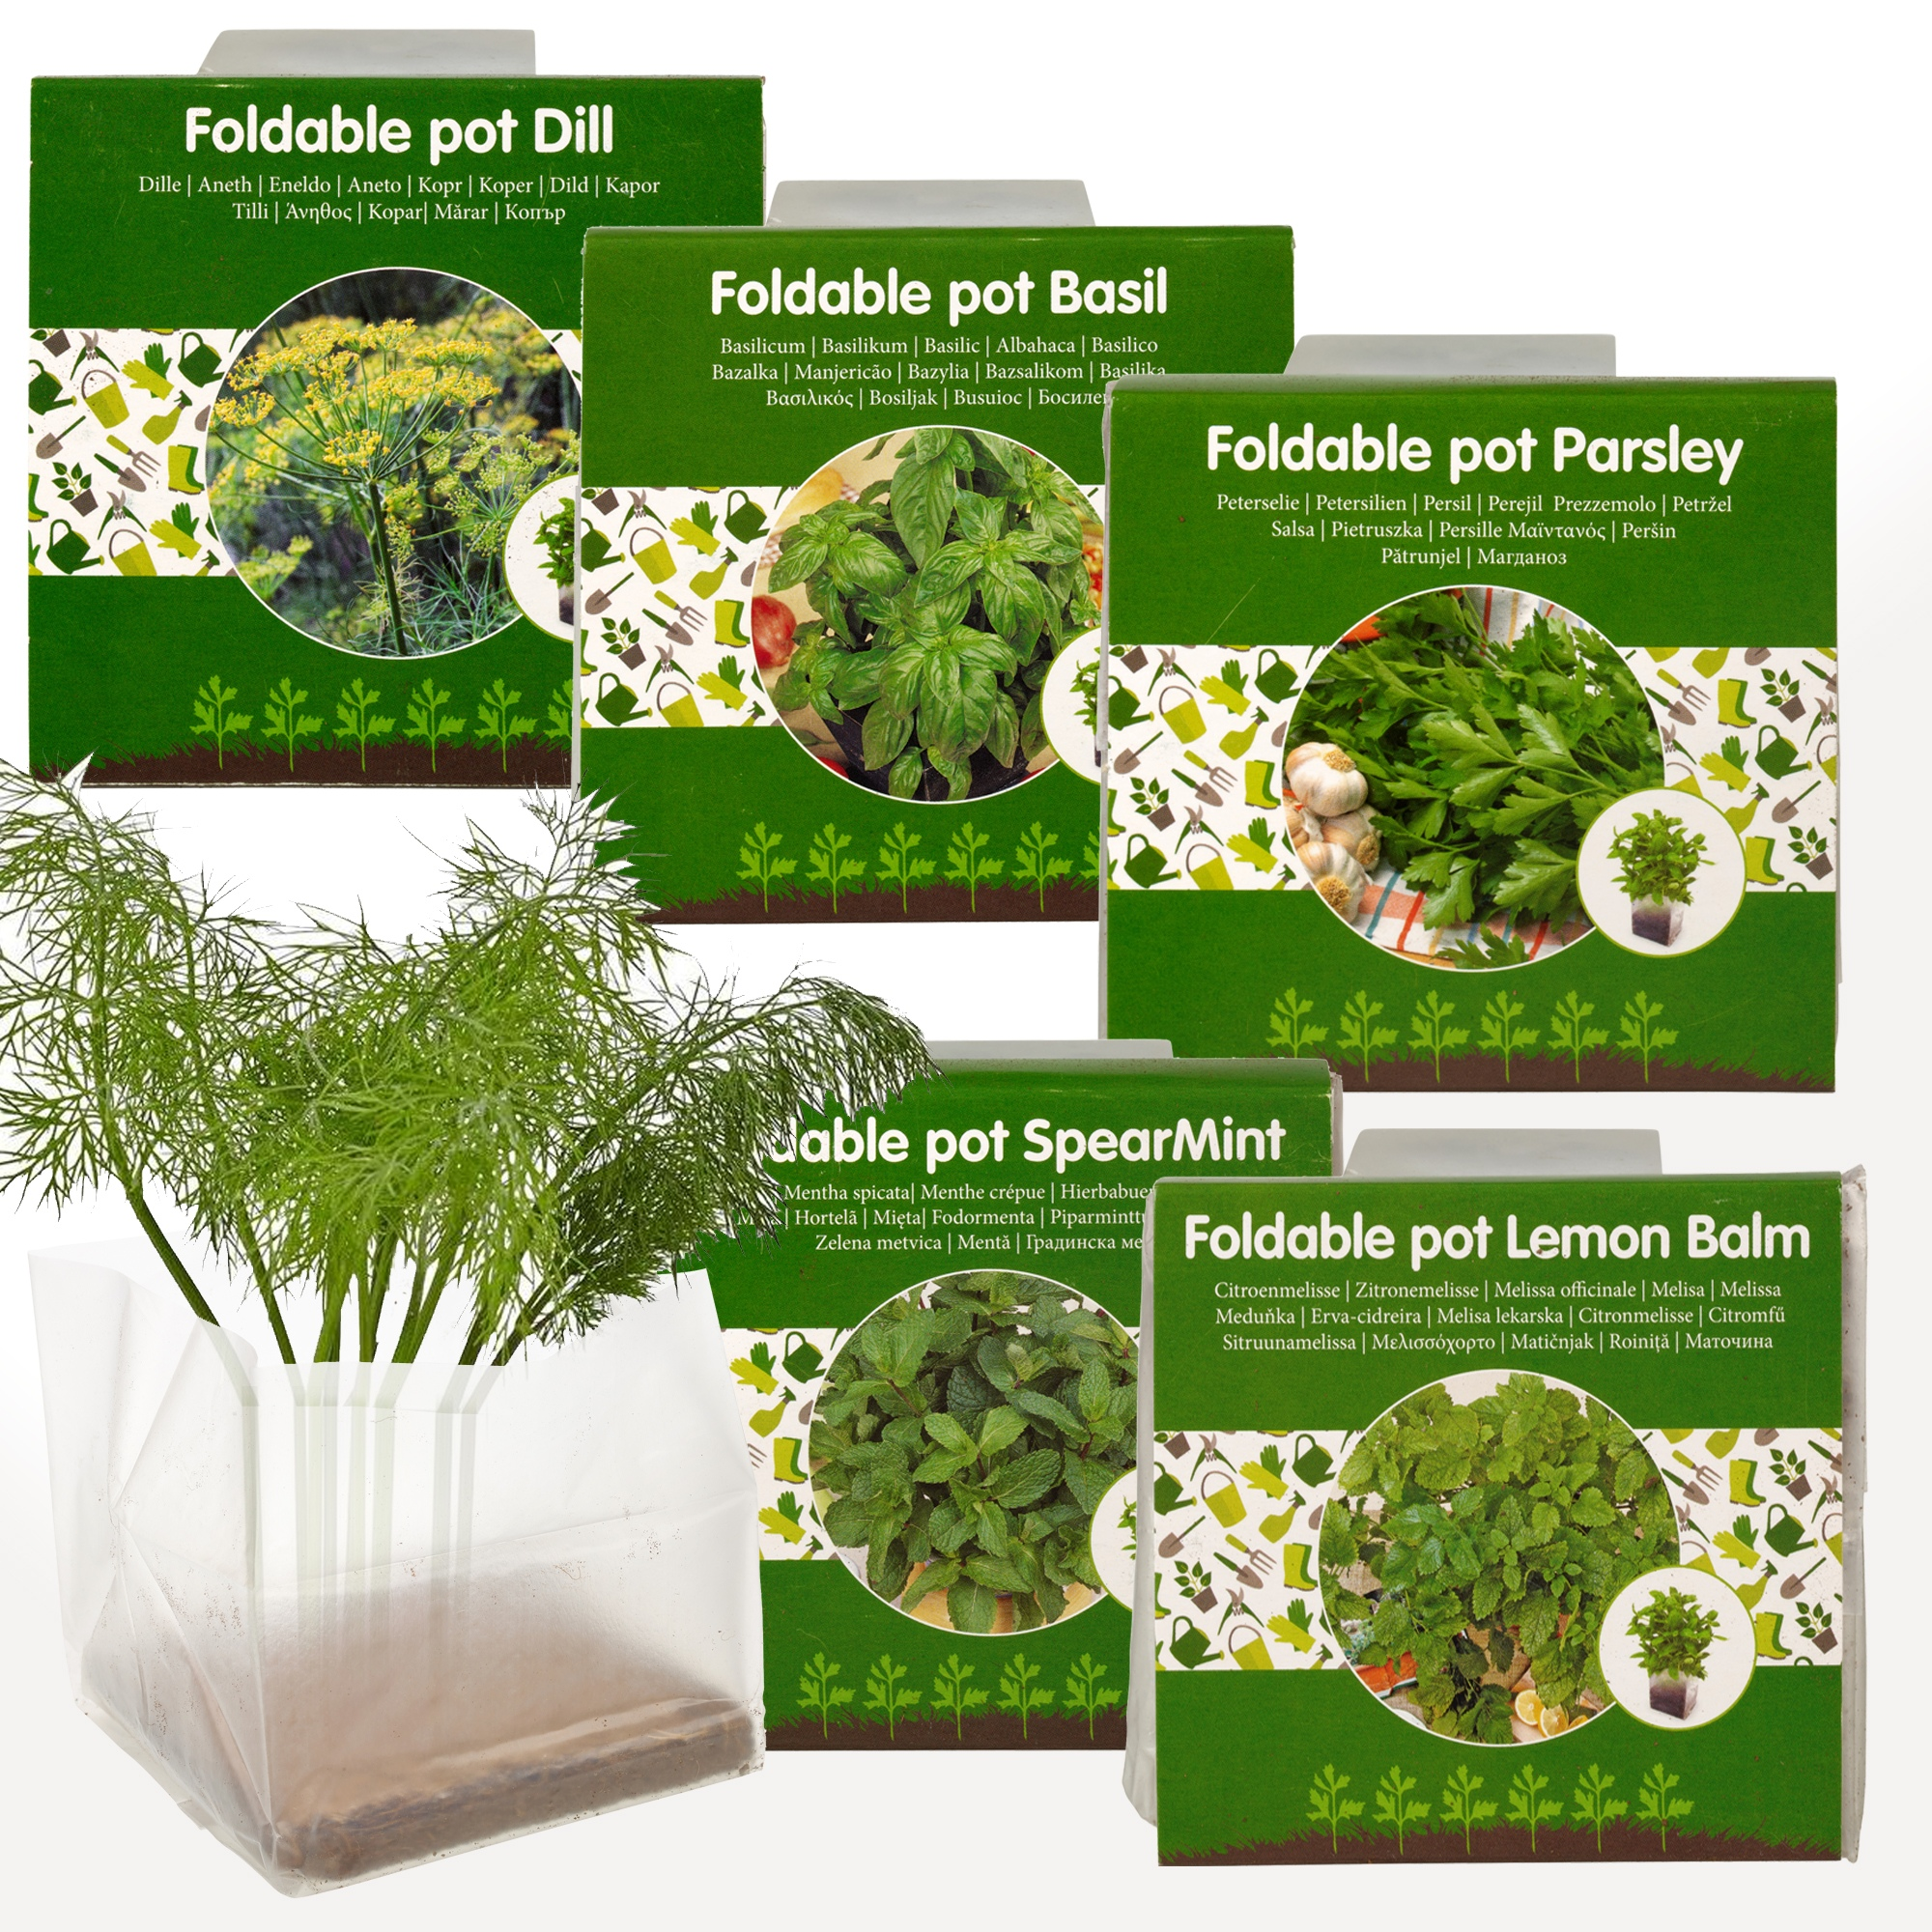 Planter Menthe En Pot details about 5 herbs seeds grow your own veg indoor kit plant pot garden  greenhouse plant set